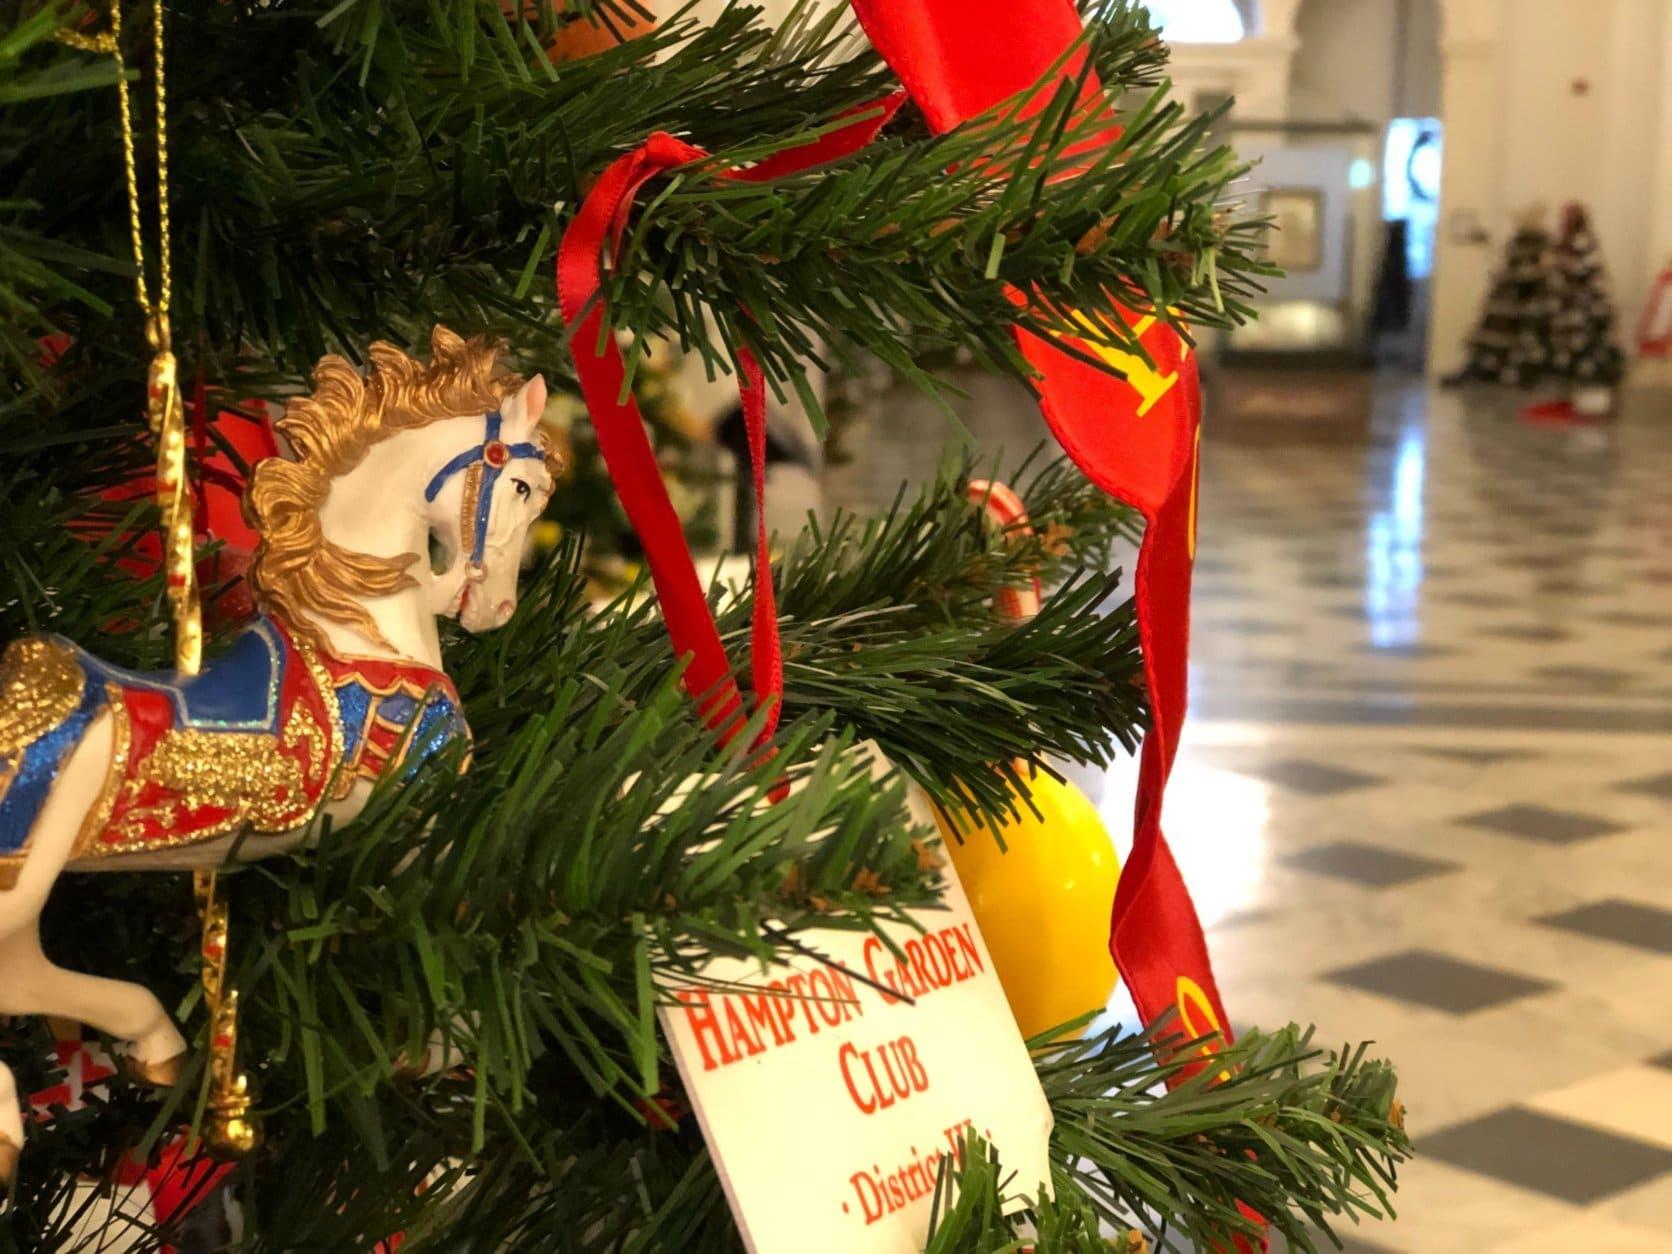 close-up photo of a Christmas tree